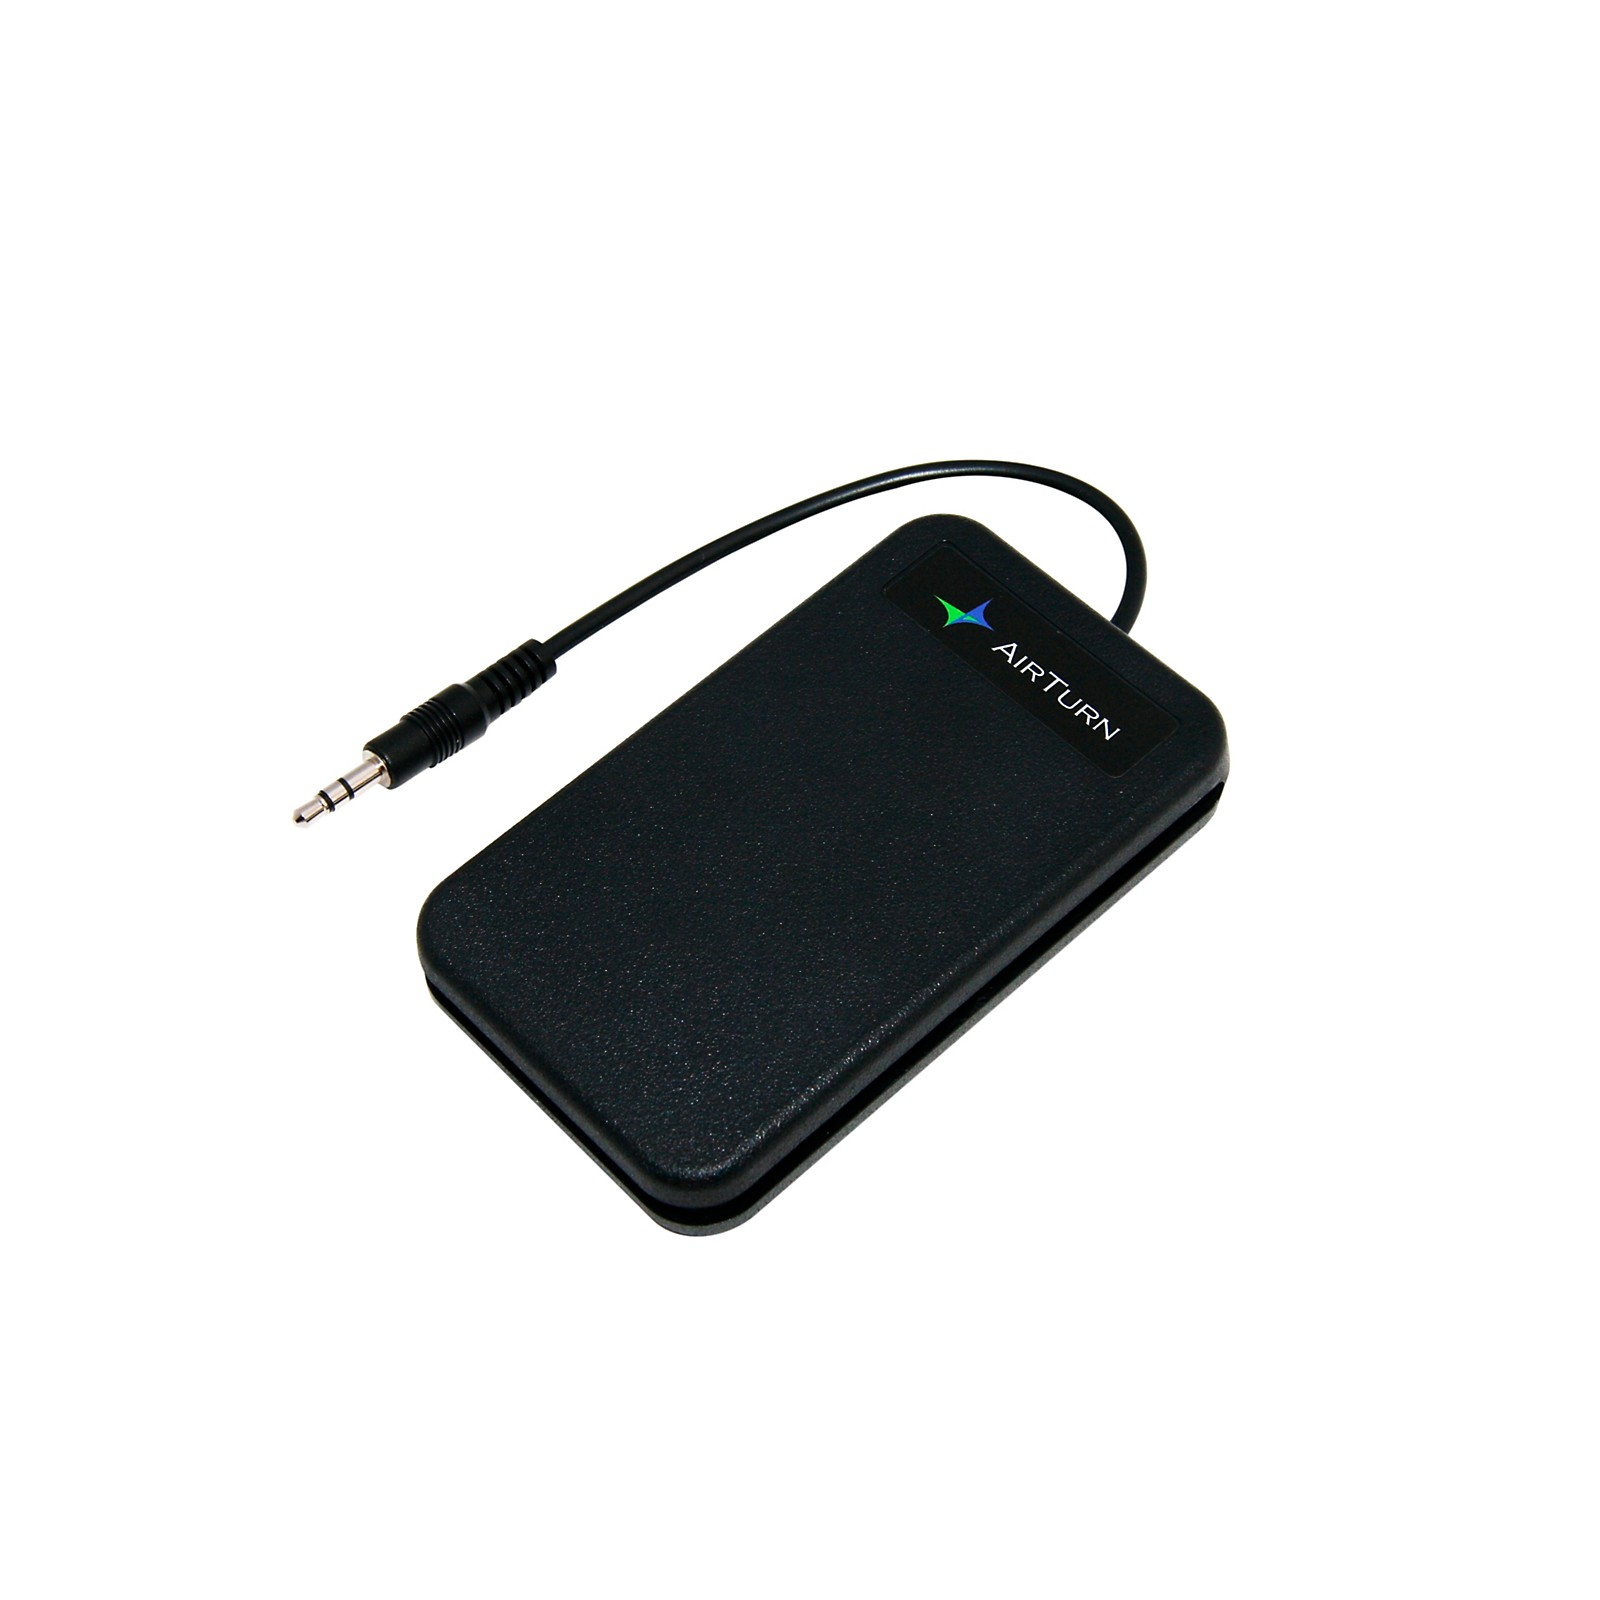 AirTurn ATFS-2 Silent Foot Switch